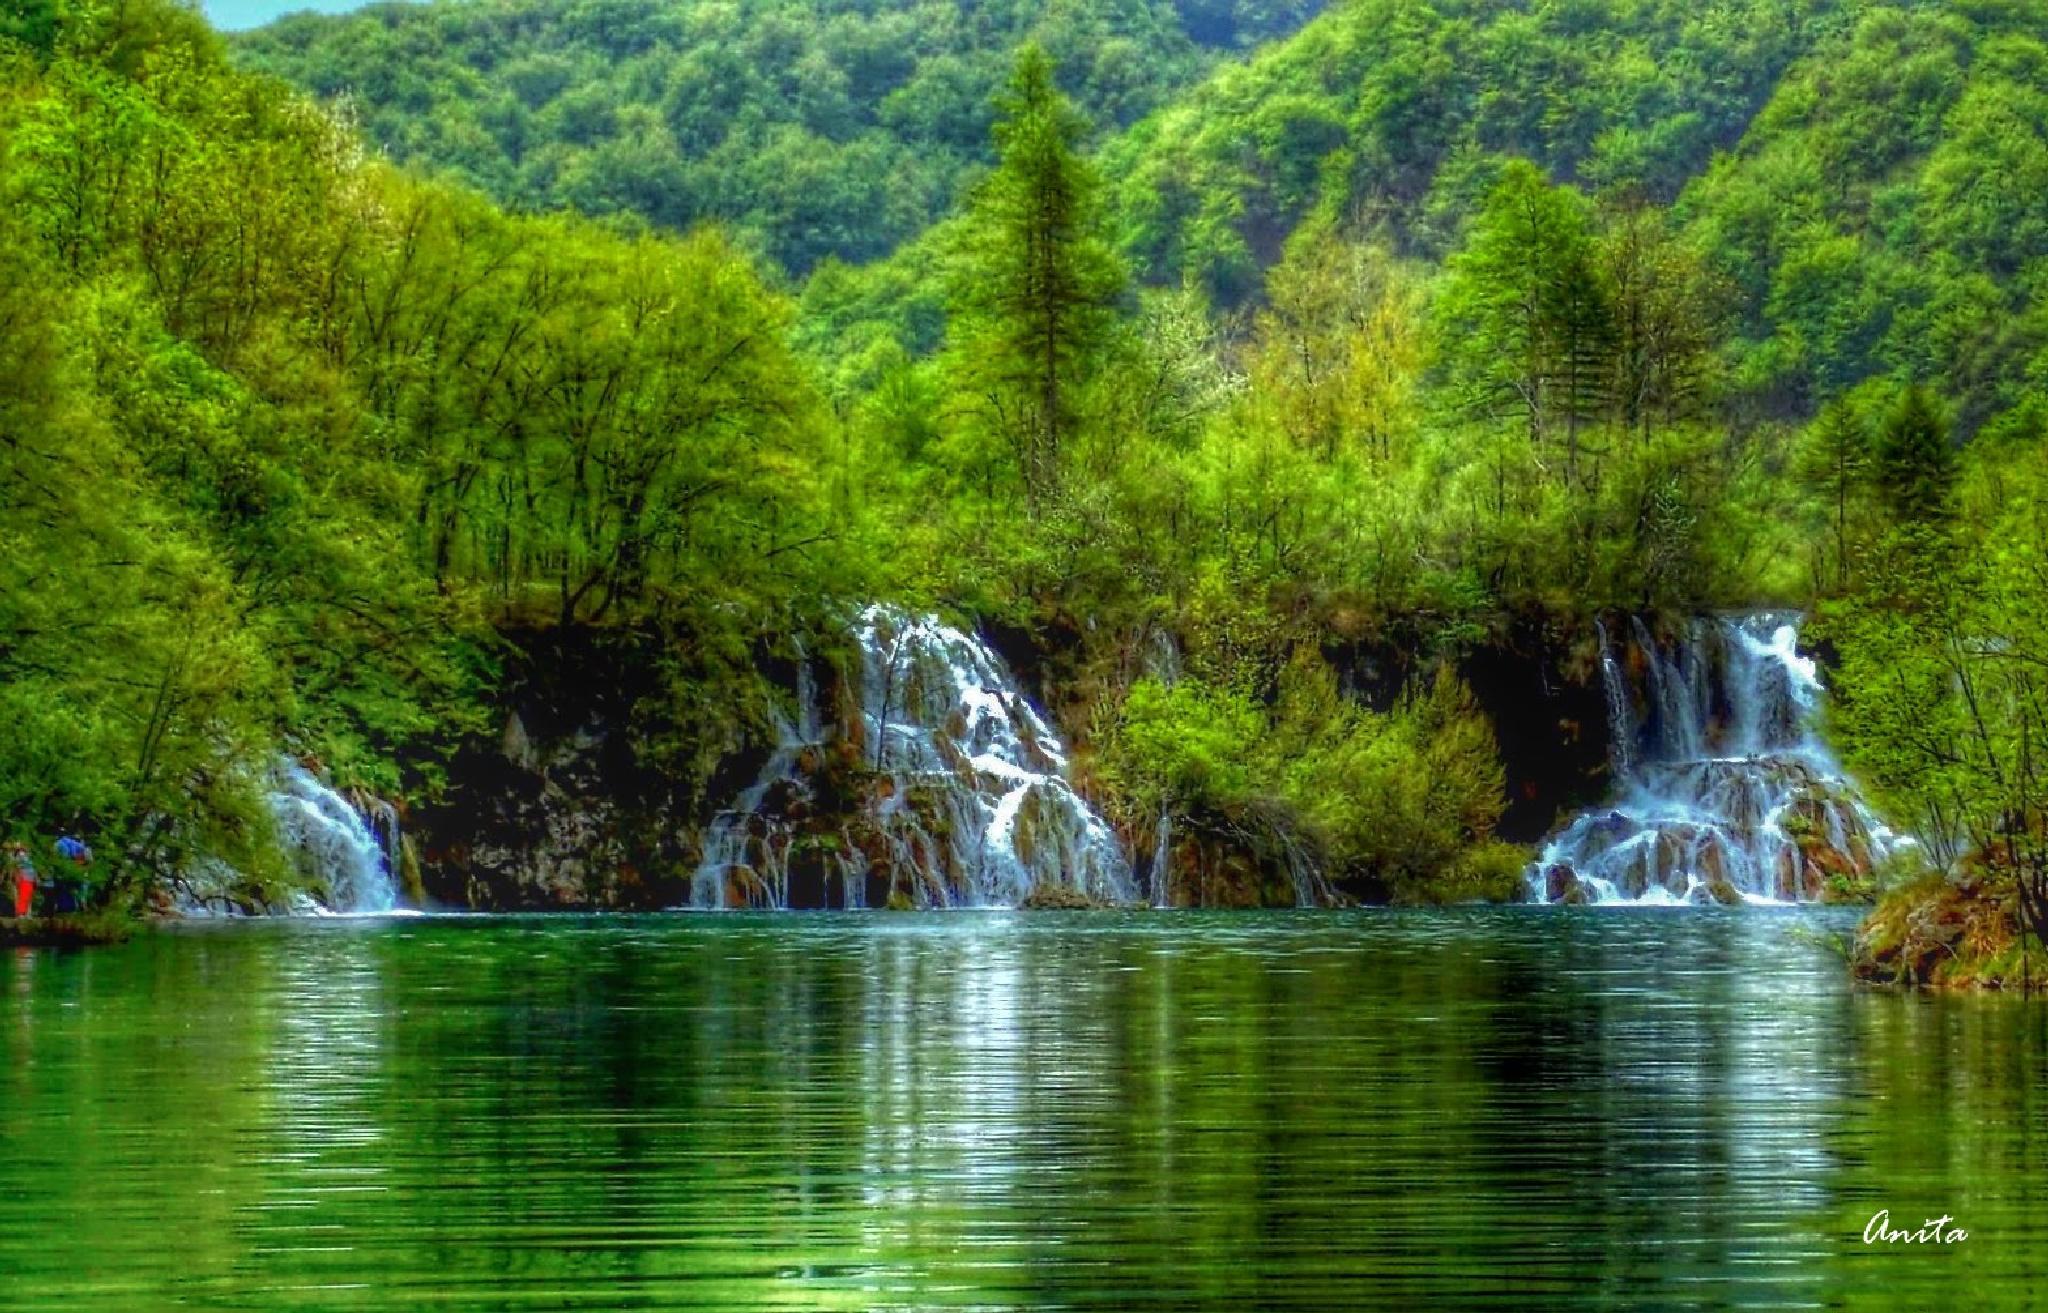 Fairy land by estellien9